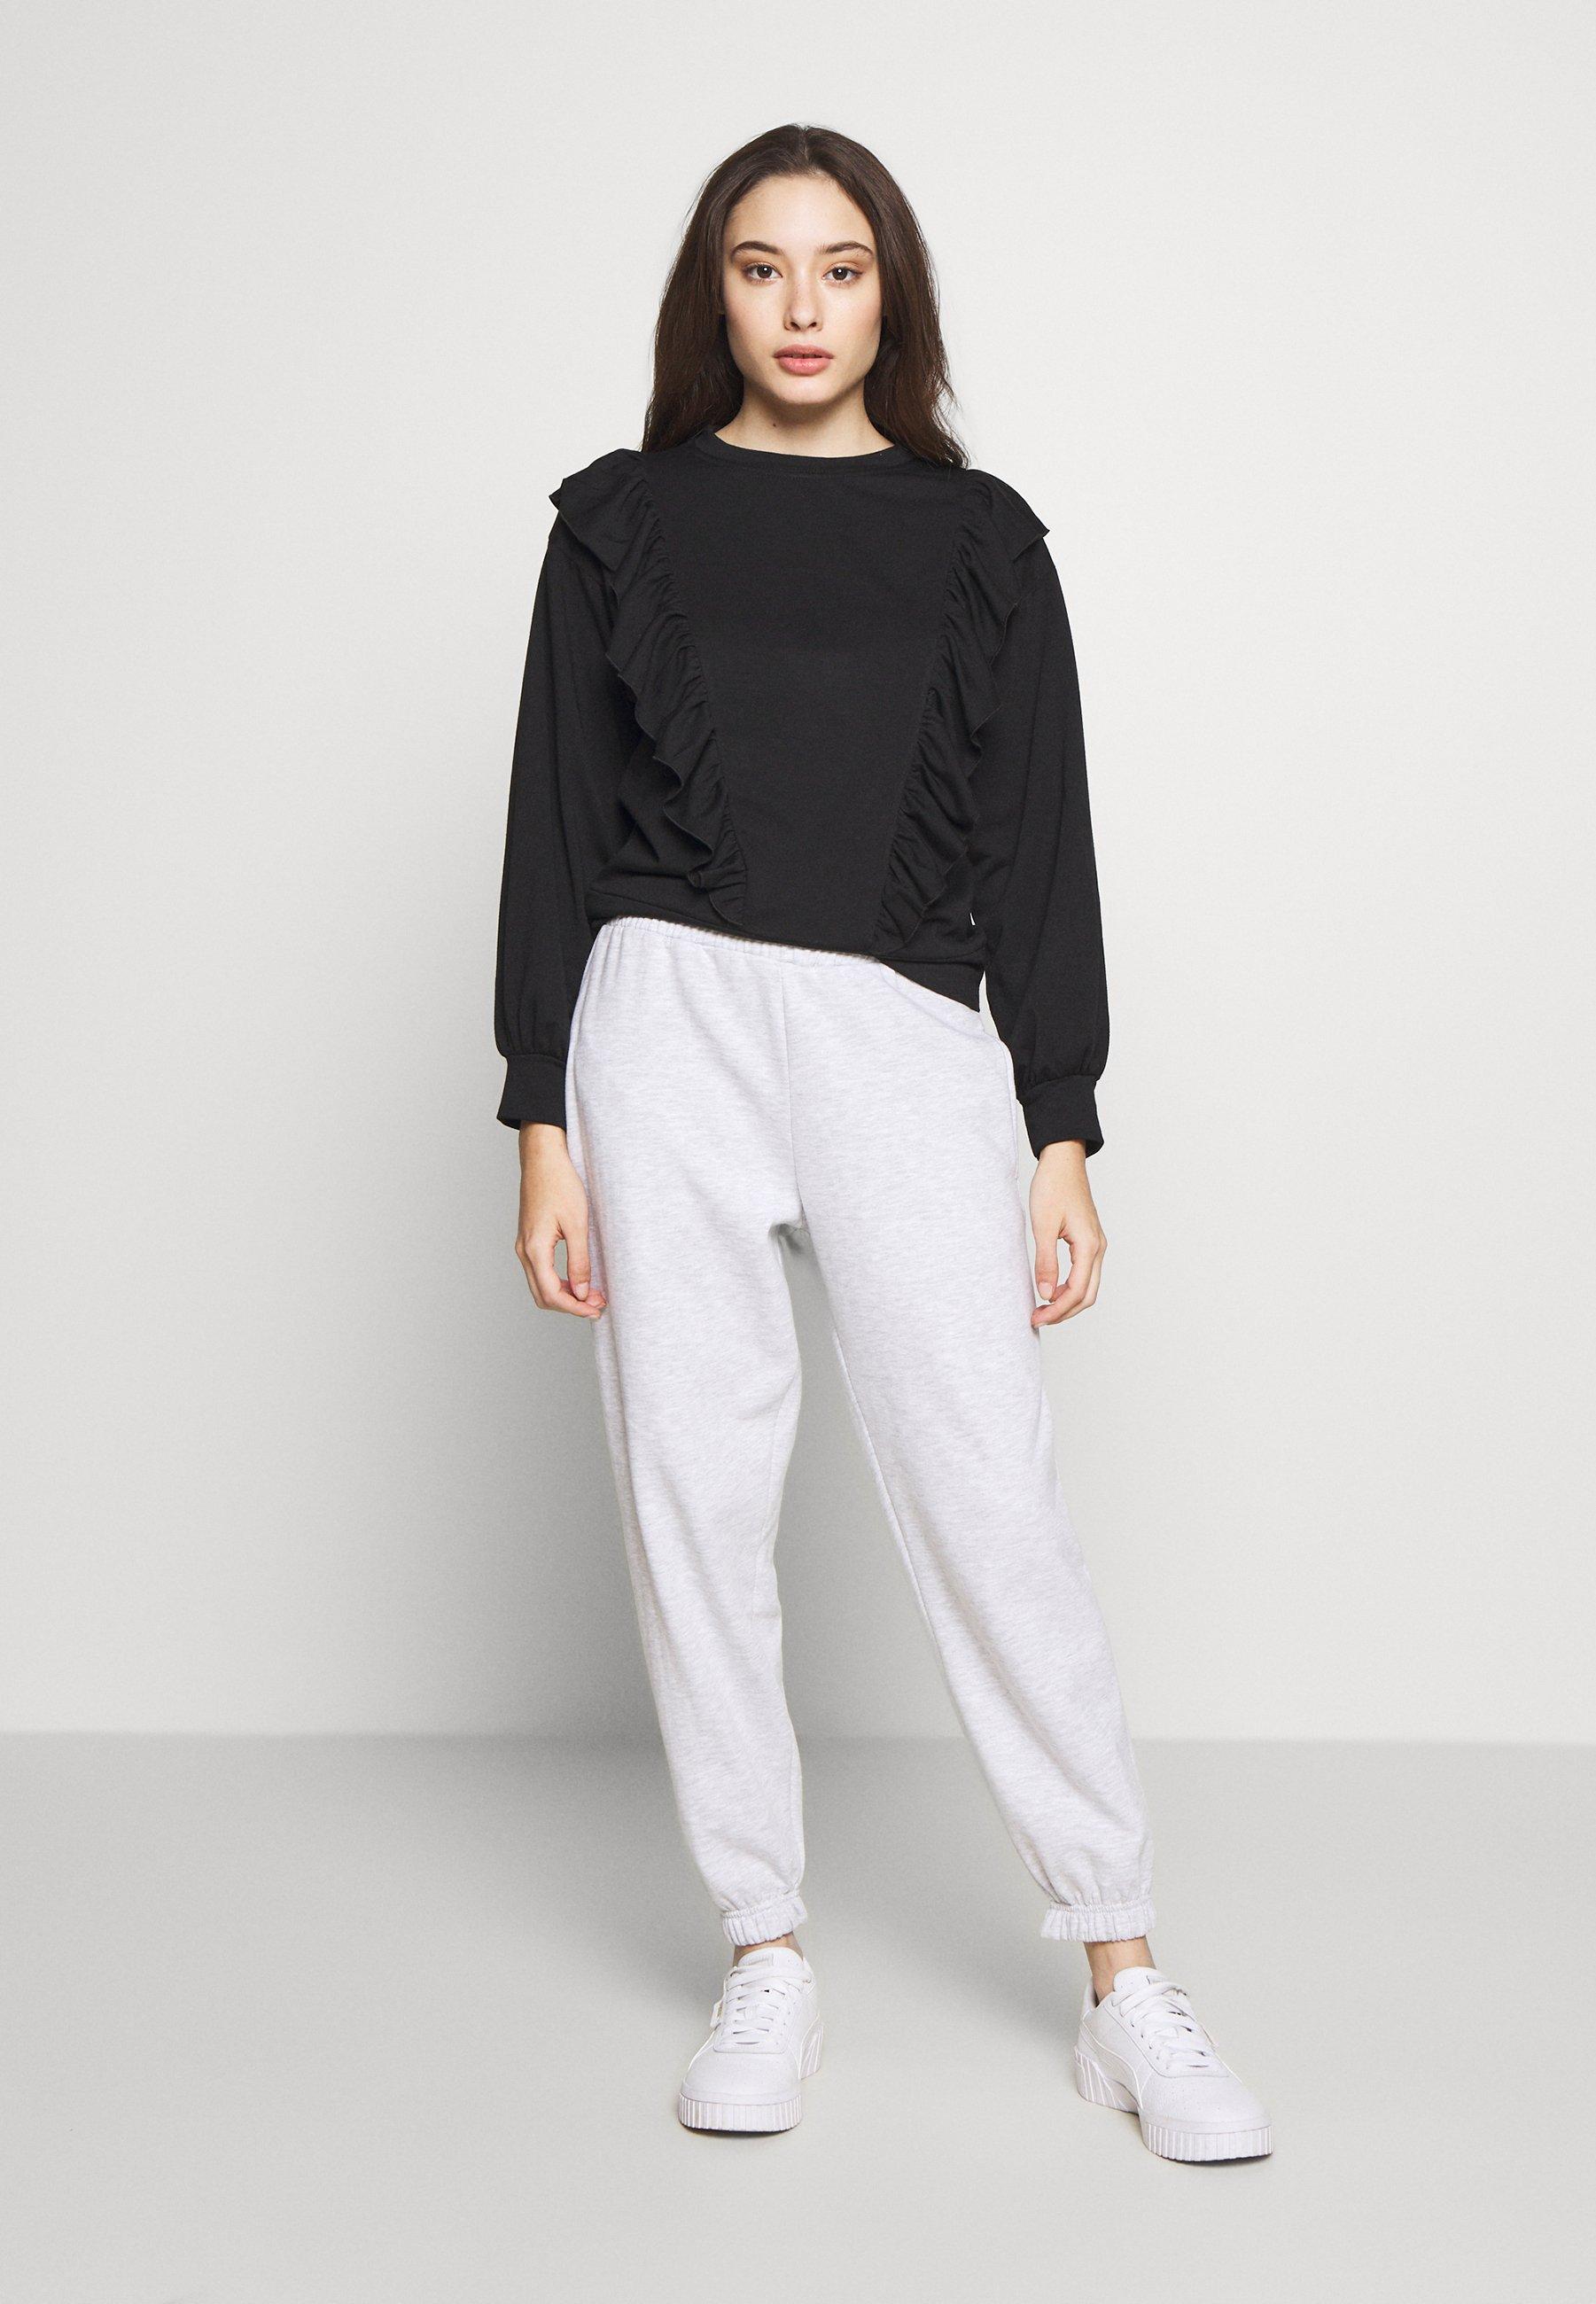 New Look Petite Bluza - black